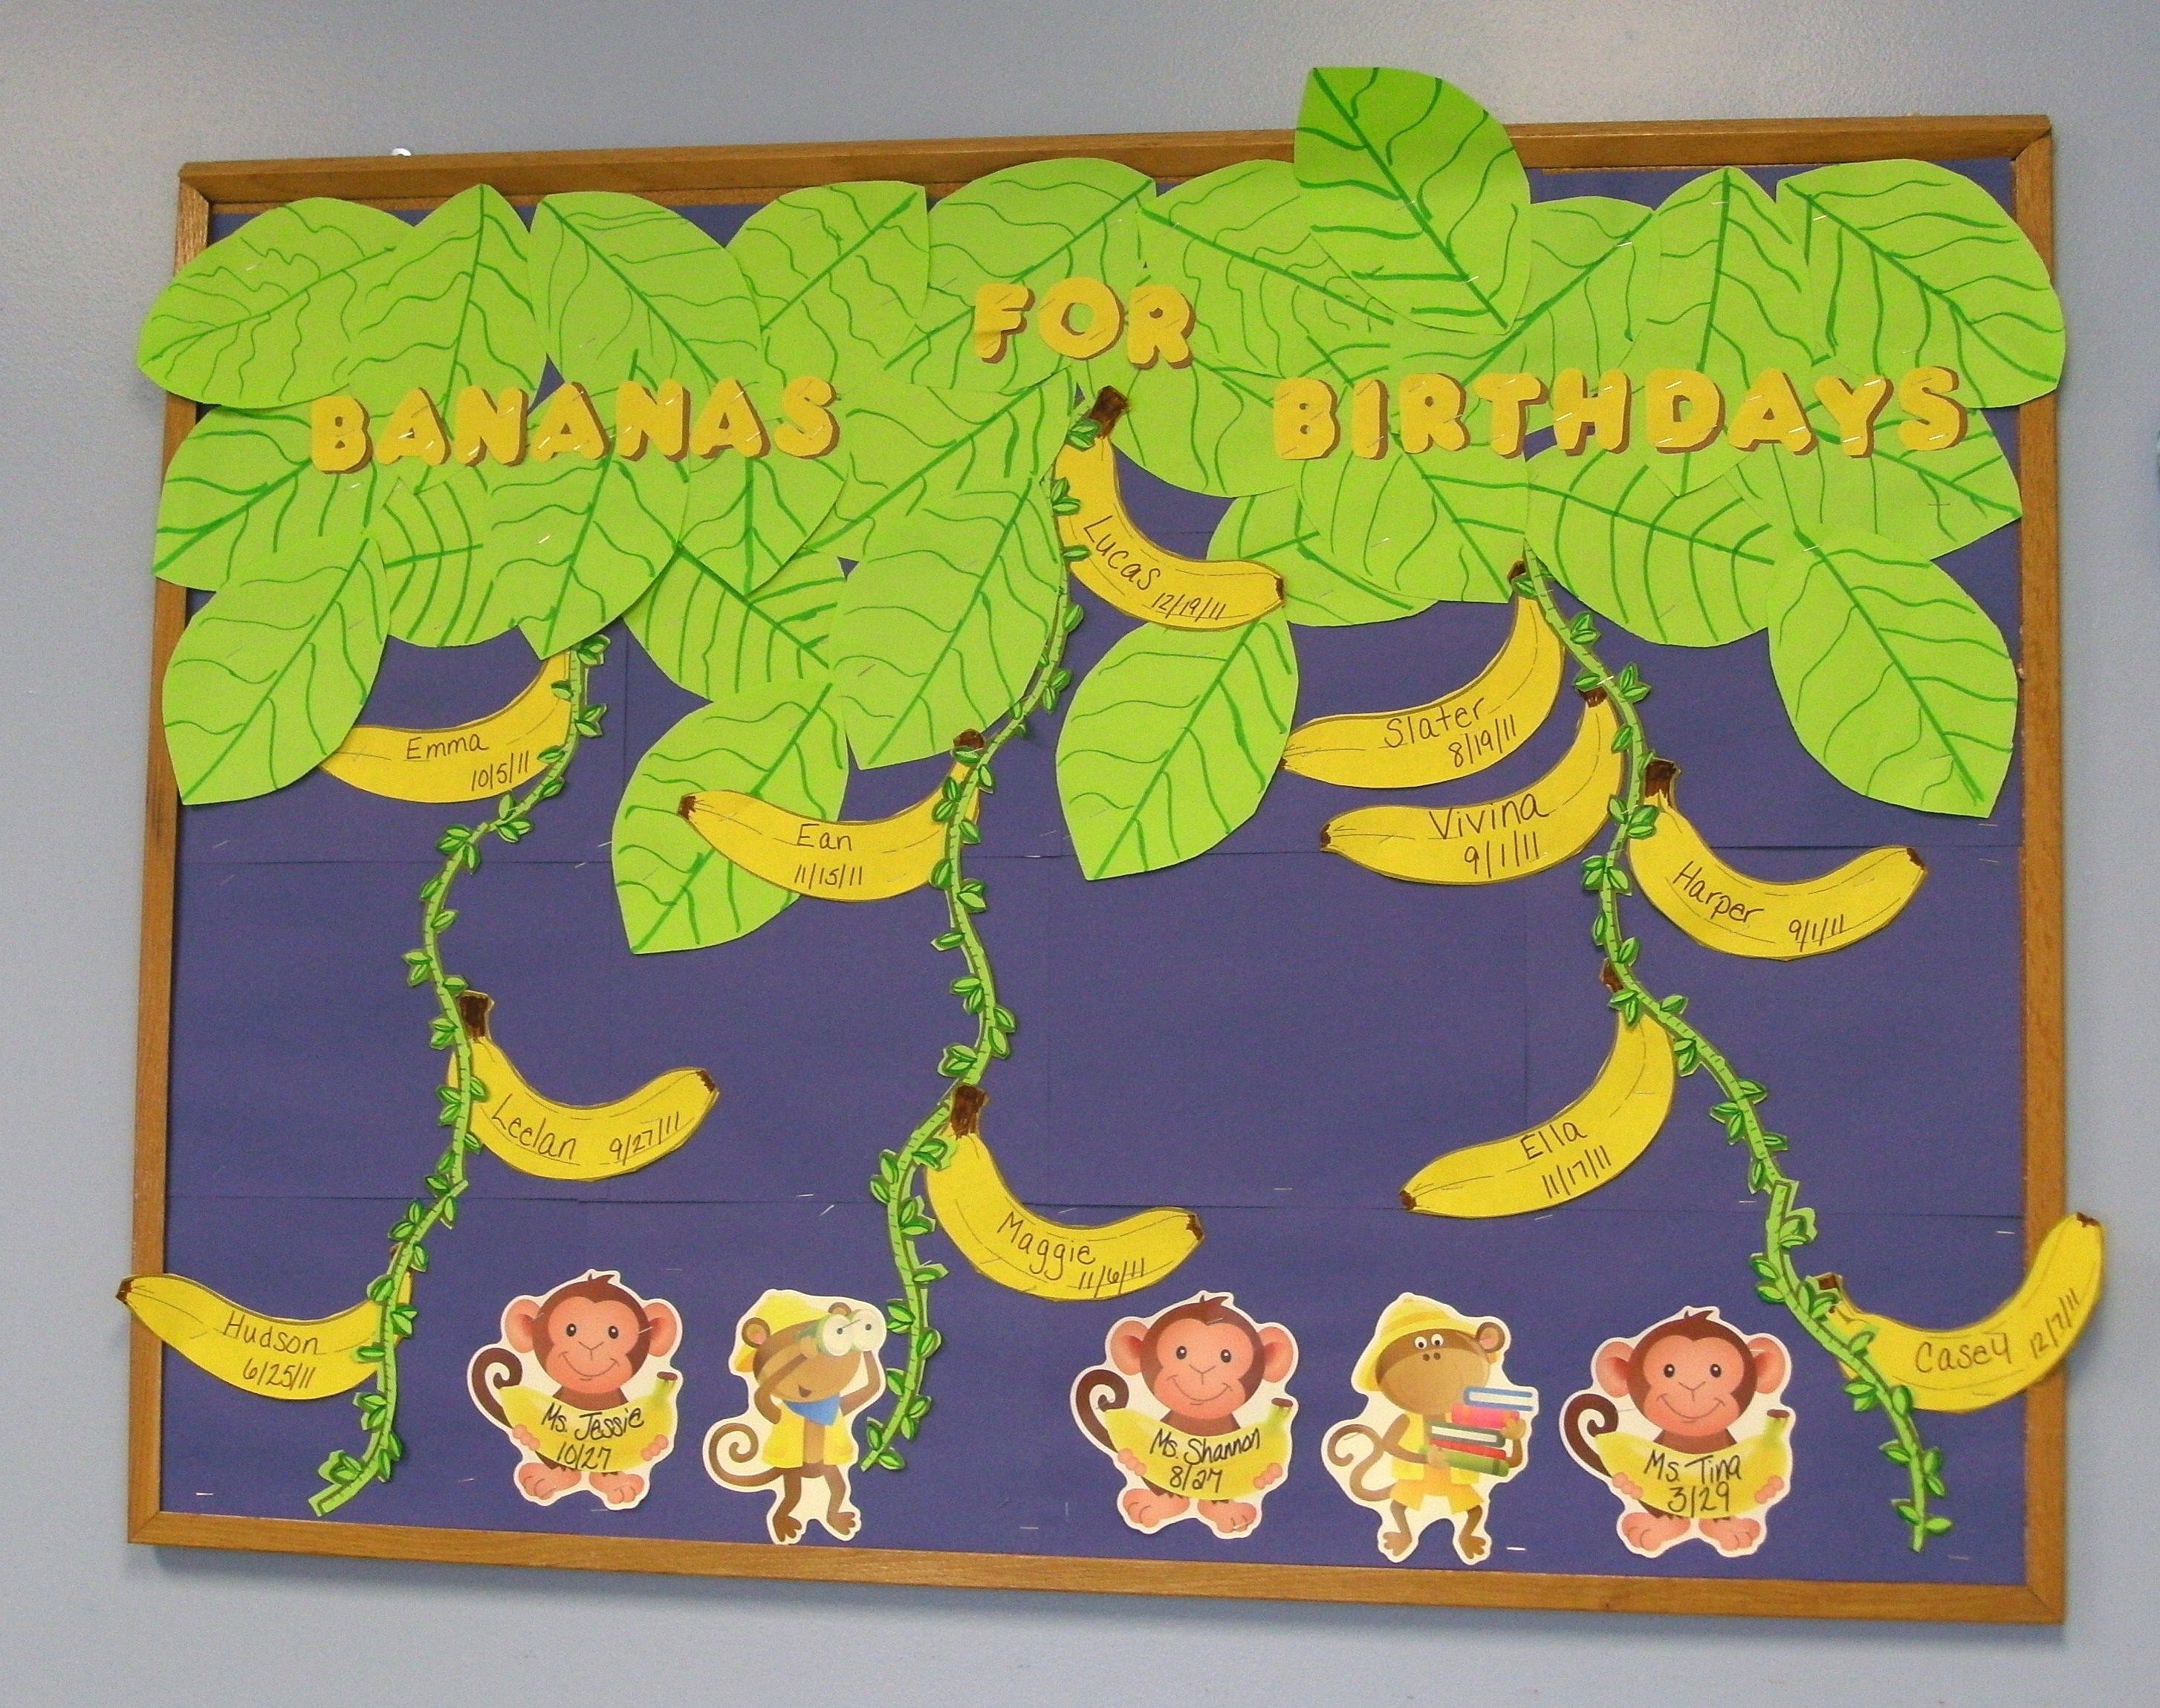 Monkey Bananas Birthday Board